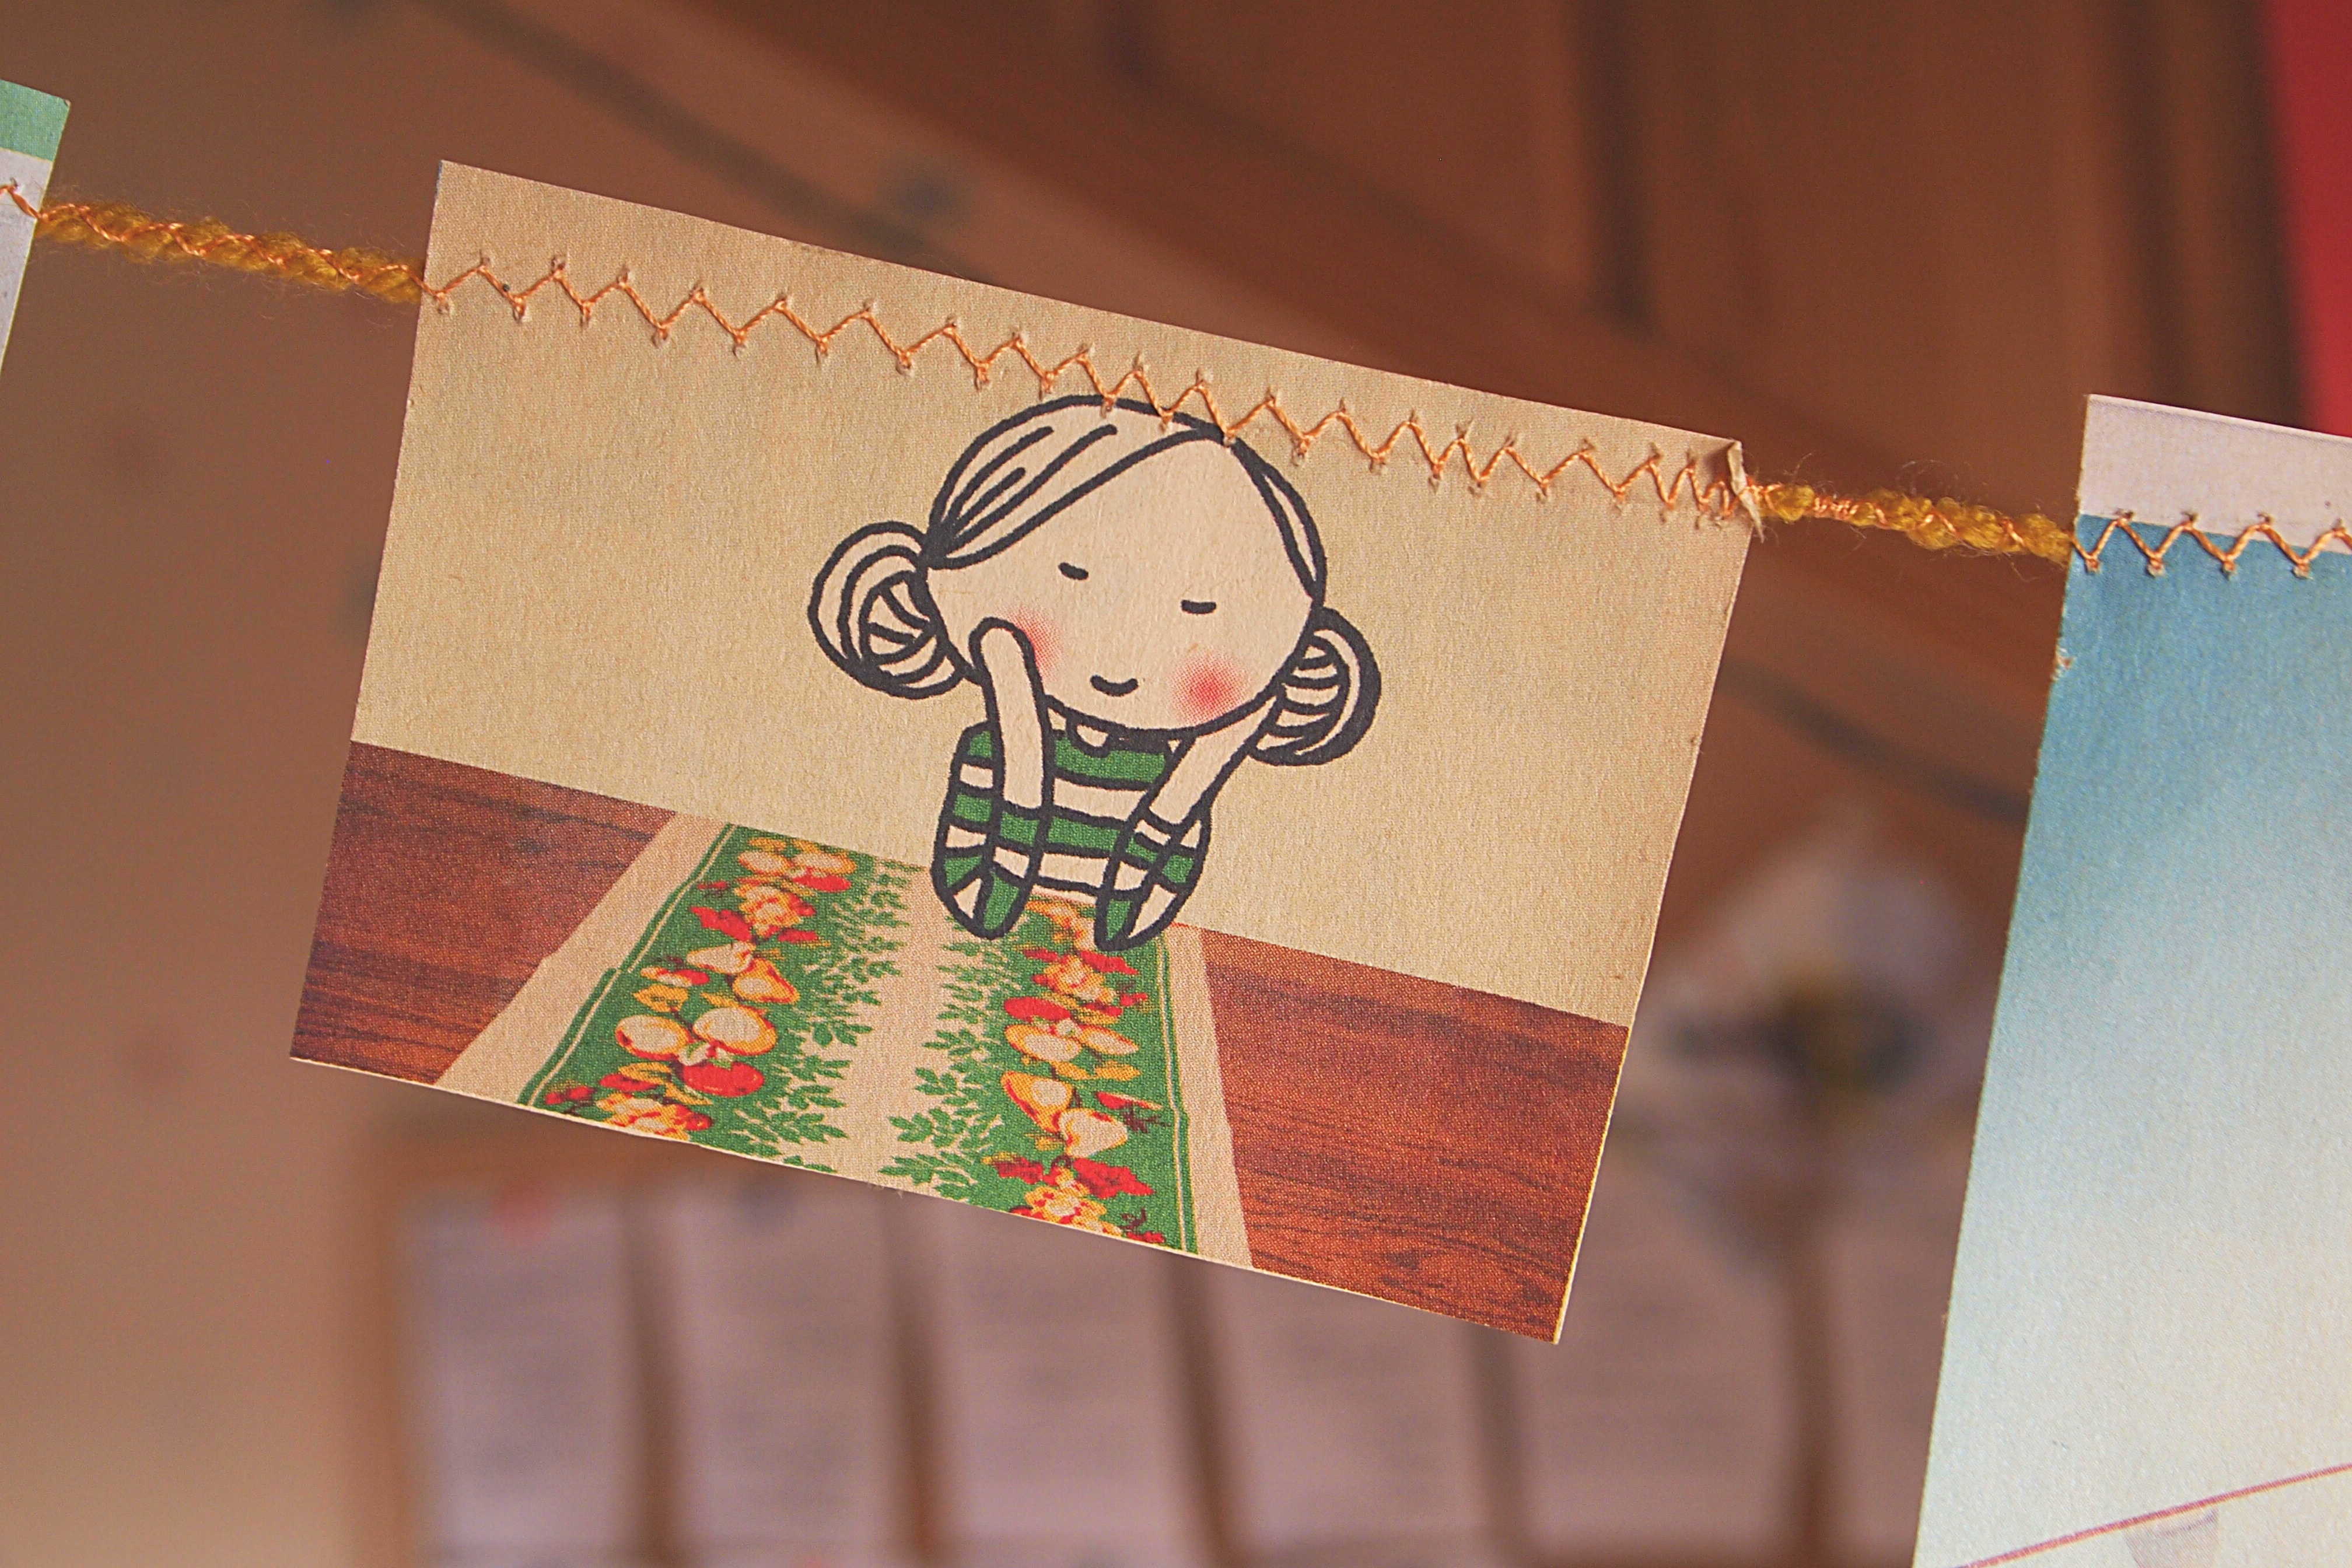 Drawing of Girl Hanging on Yarn